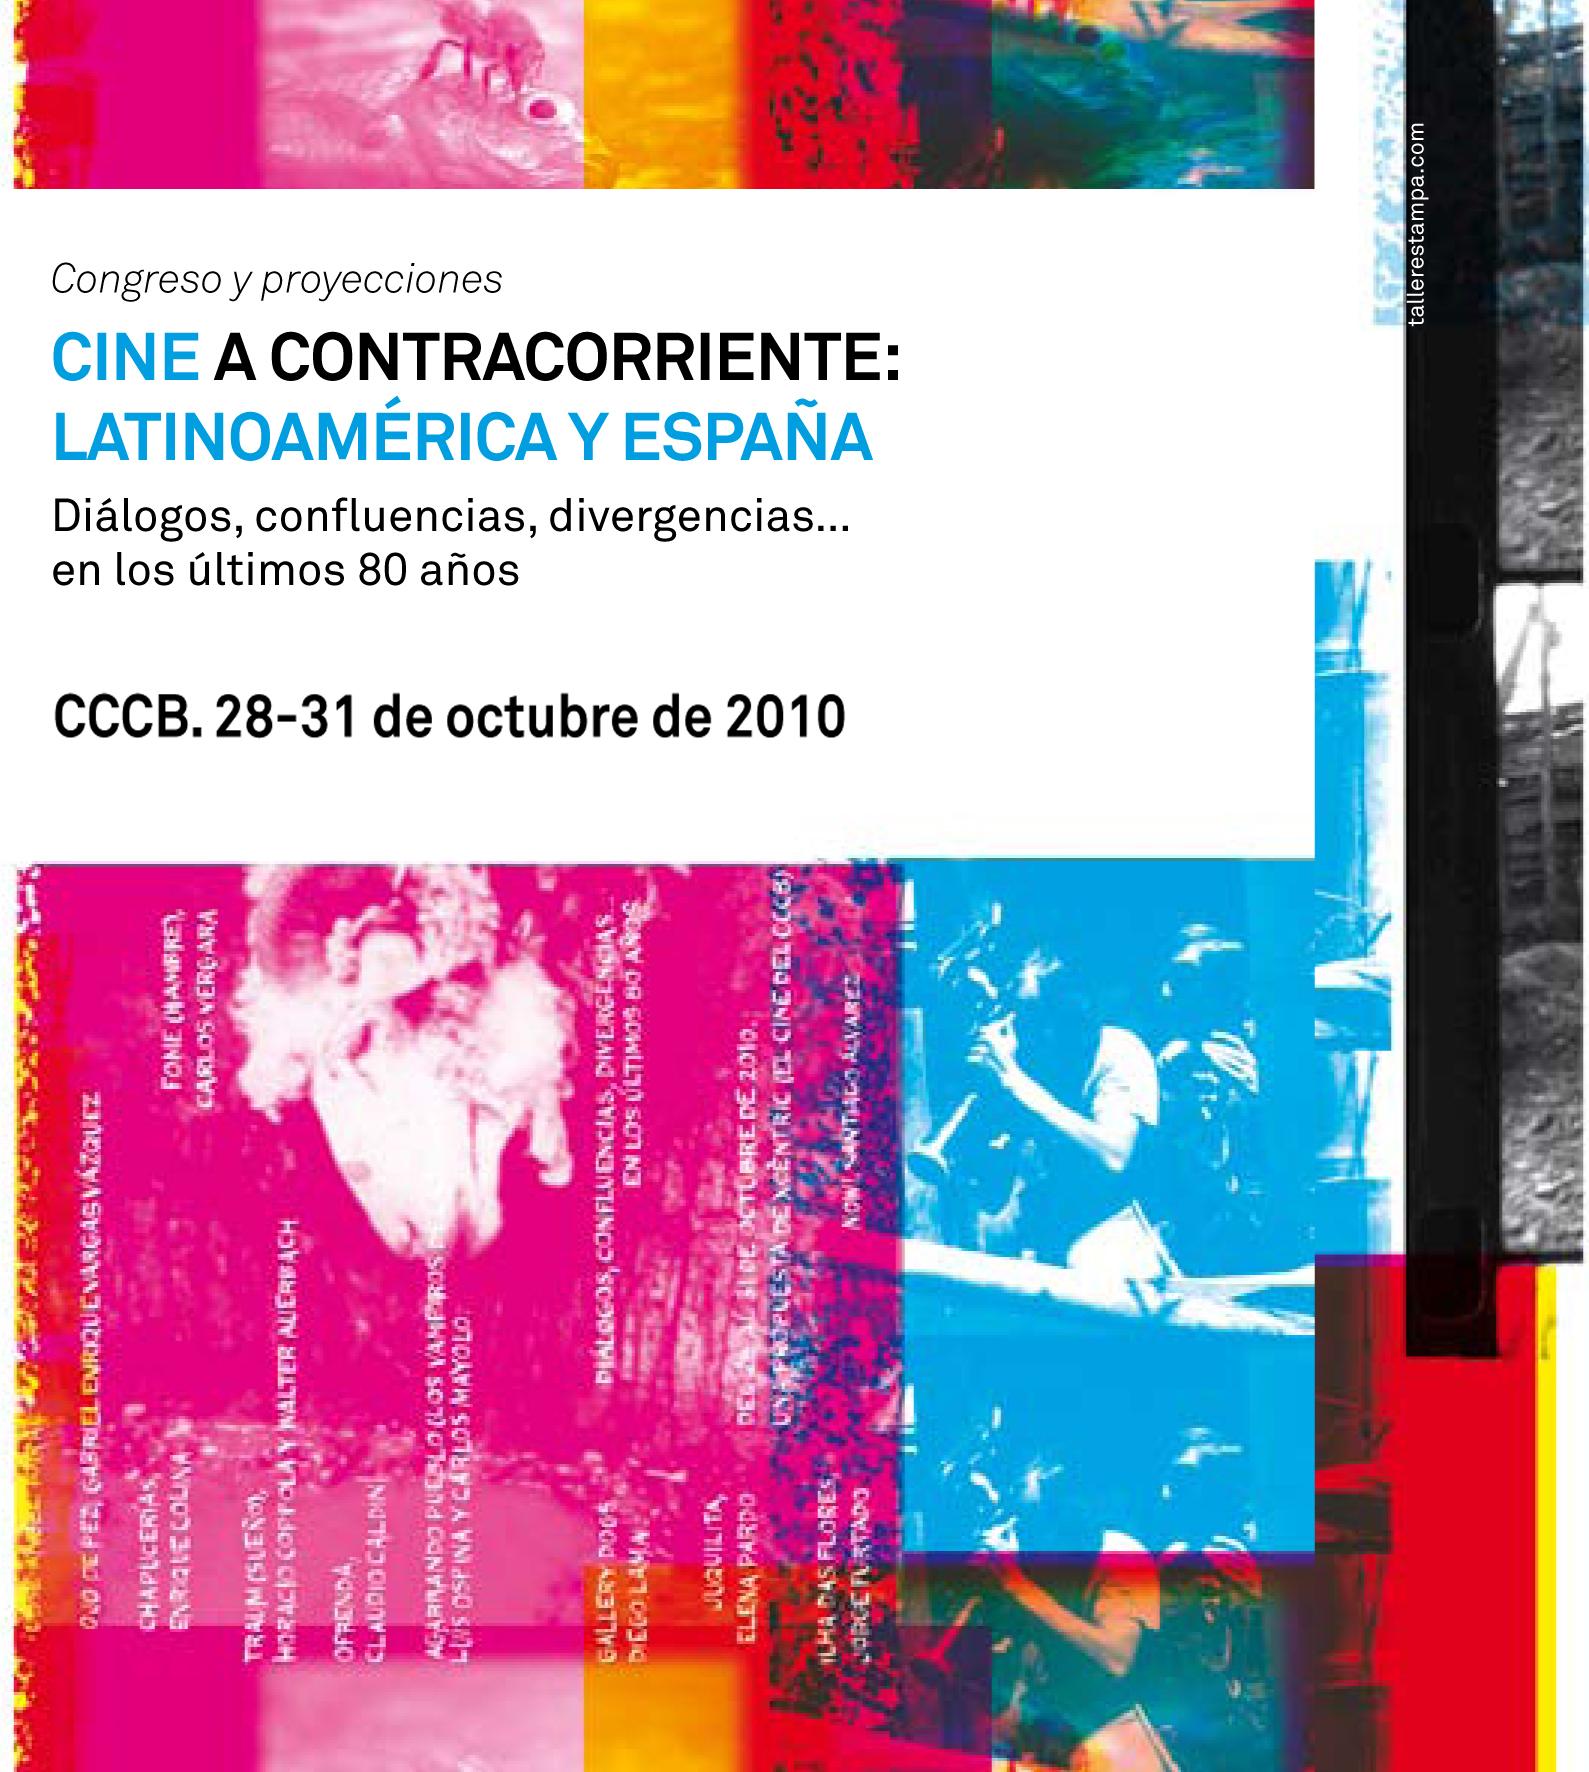 Antoni-Pinent-curator-CINEMA-AGAINST-THE-TIDE-cine-a-contracorriente